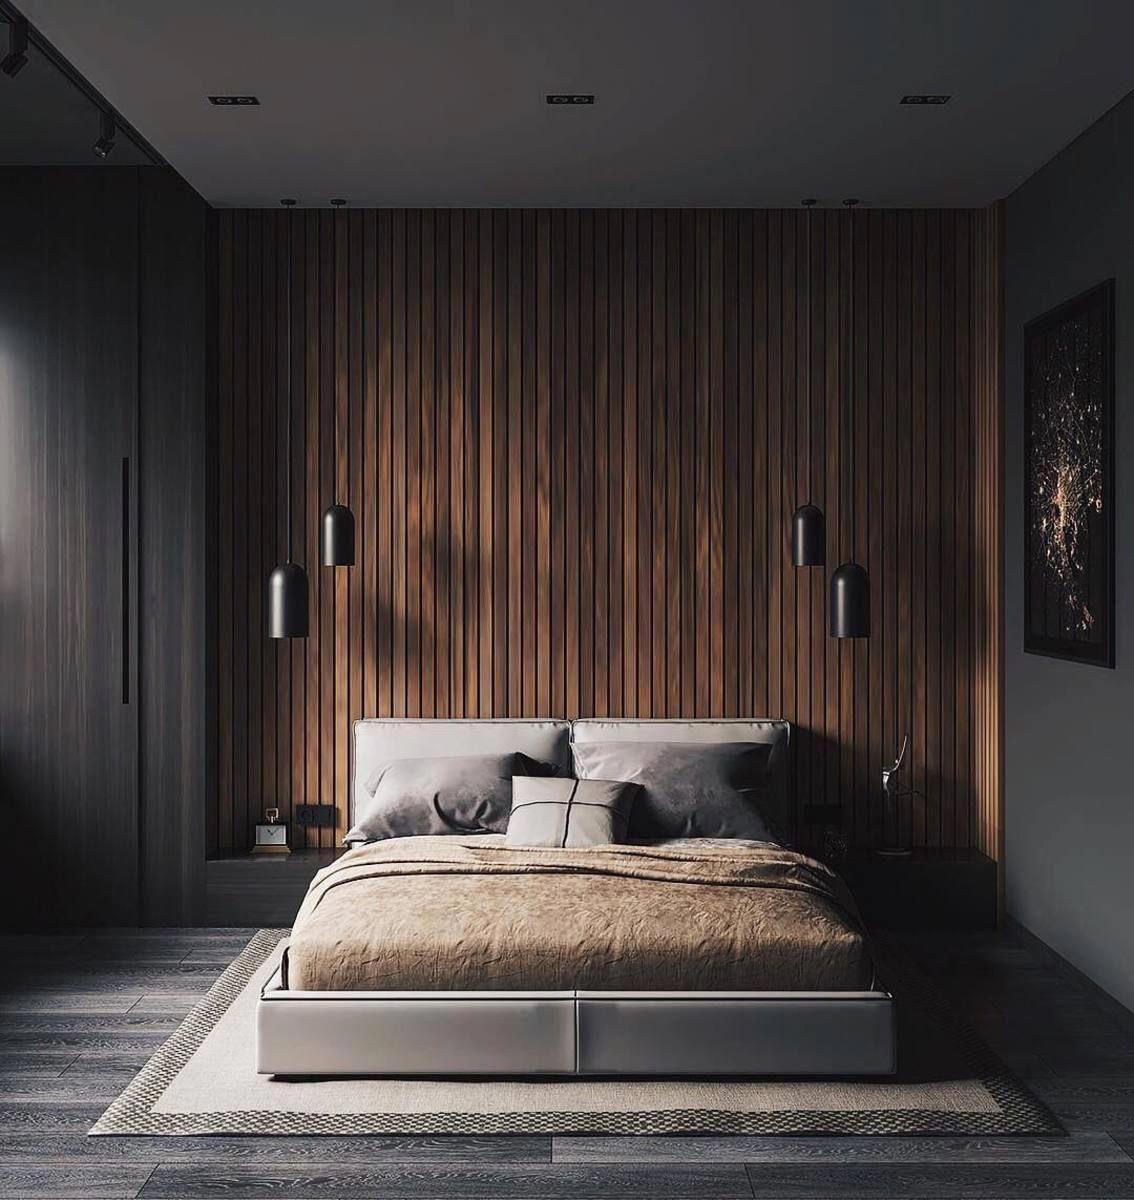 Minimal Interior Design Inspiration 171 Luxurious Bedrooms Minimal Interior Design Minimalism Interior